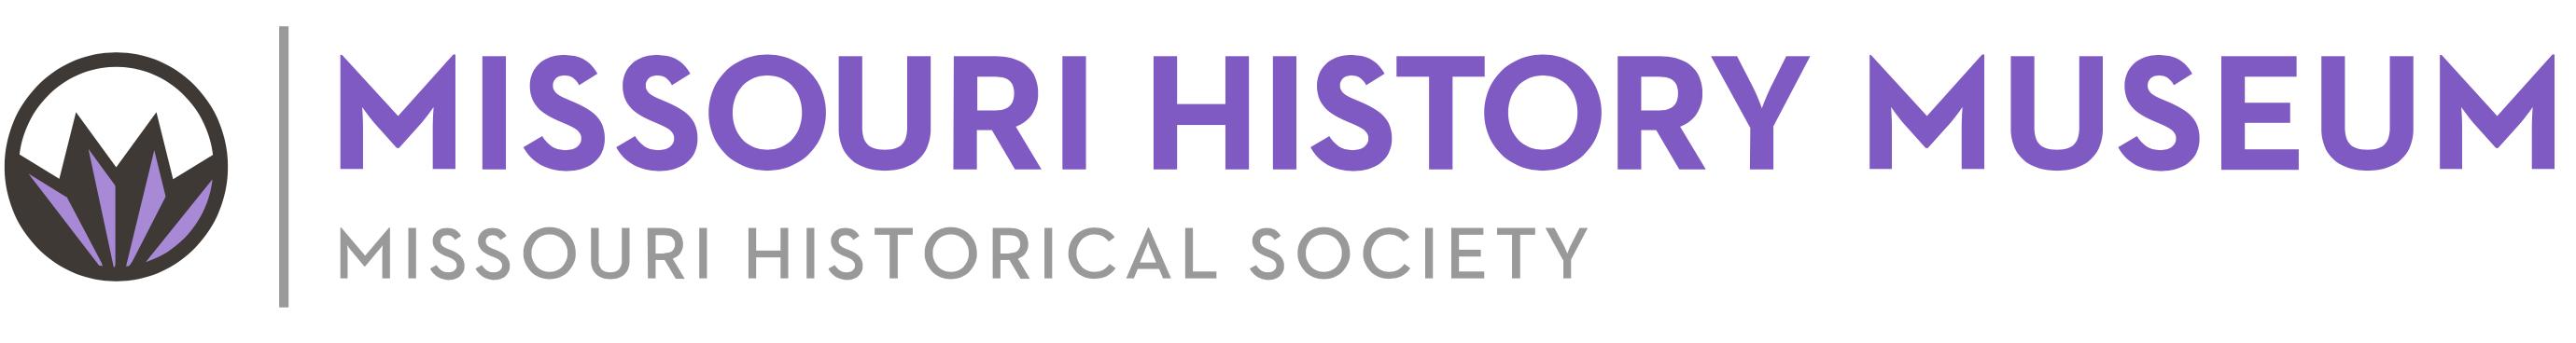 Logo for Missouri History Museum, Historical Society